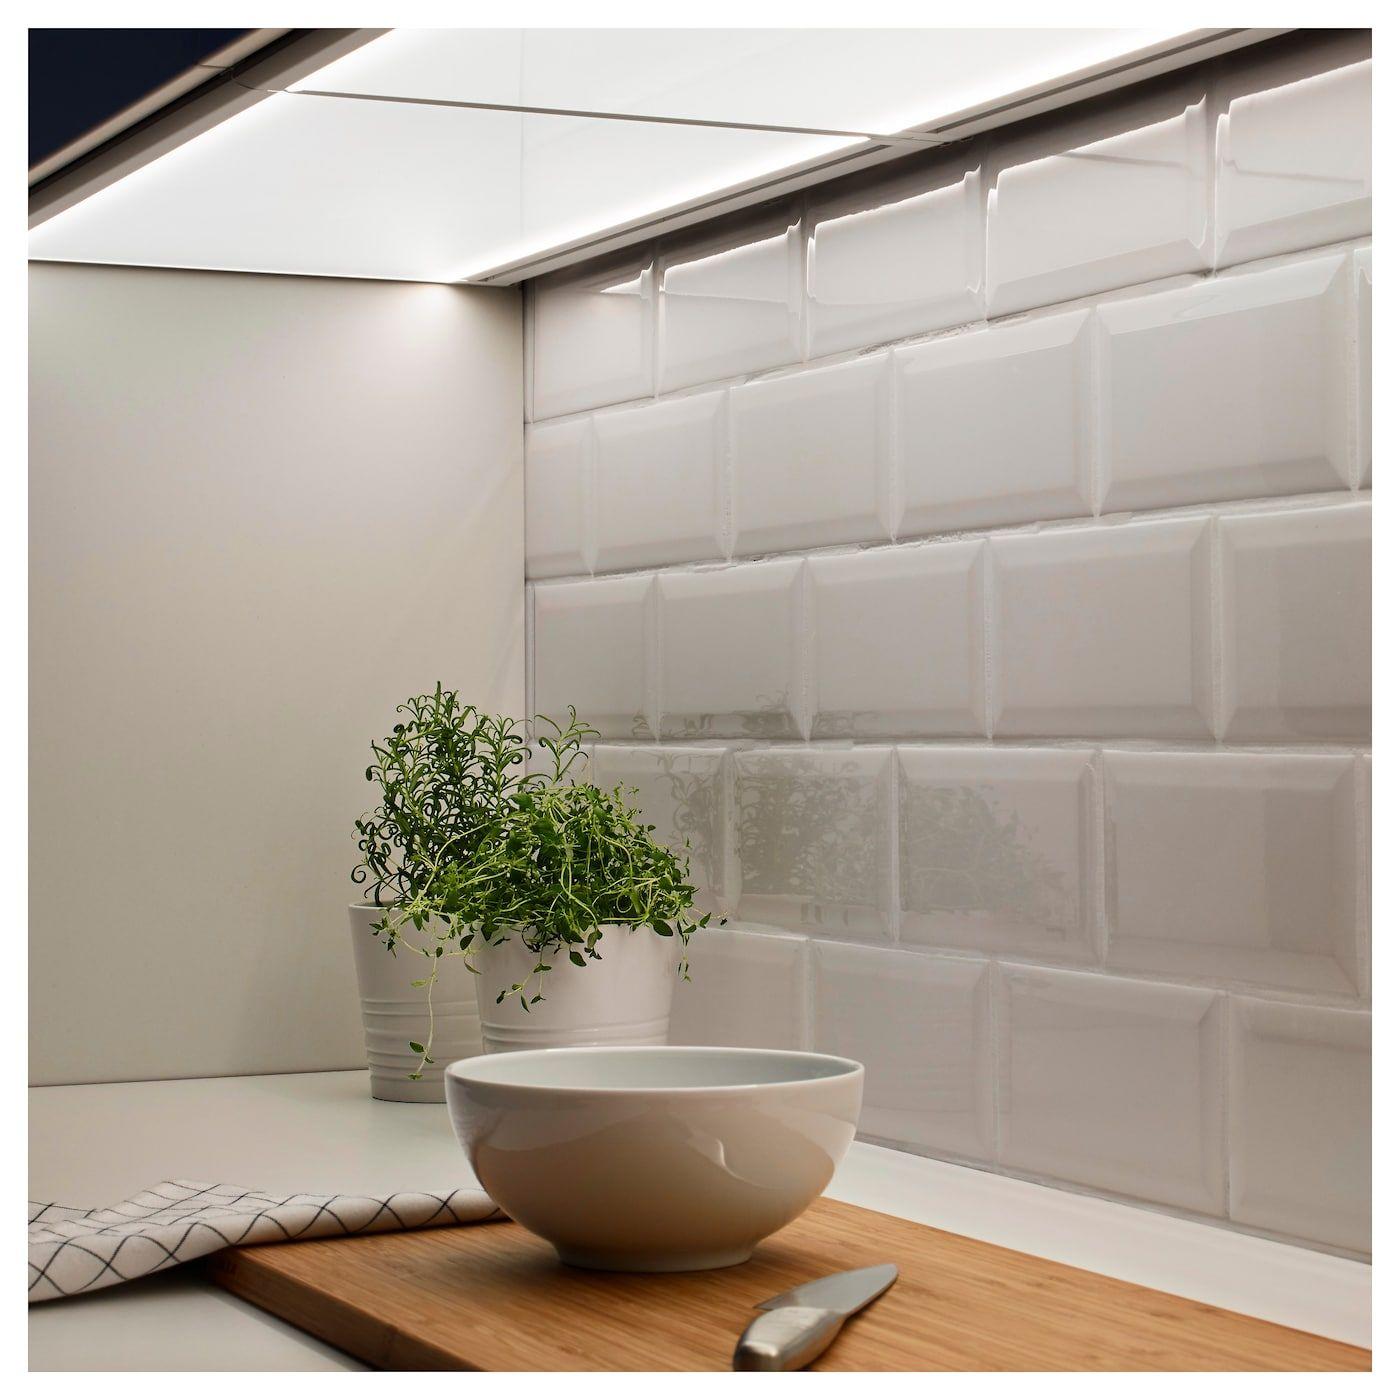 IRSTA Arbeitsbeleuchtung, LED - opalweiß - IKEA Österreich  Led